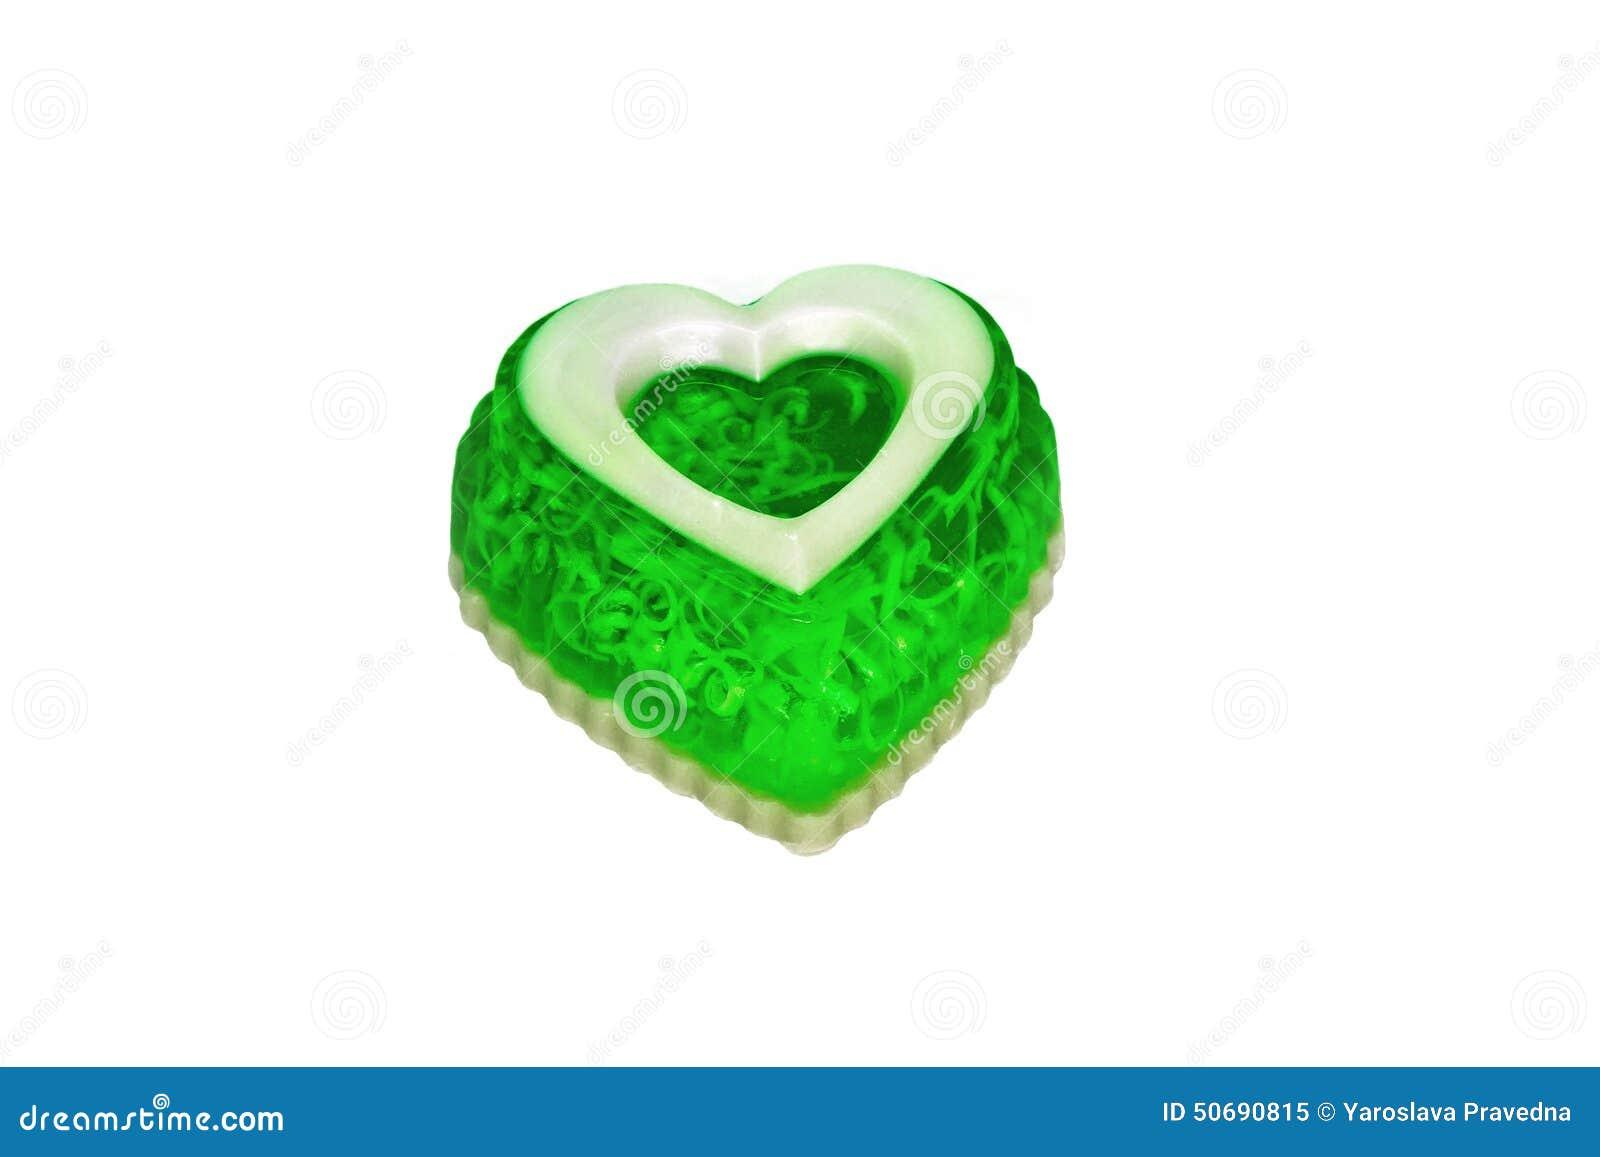 Download 肥皂作为绿色心脏 库存图片. 图片 包括有 孤立, 对象, 生气勃勃, 绿色, 耐洗, 洁净, 特写镜头 - 50690815